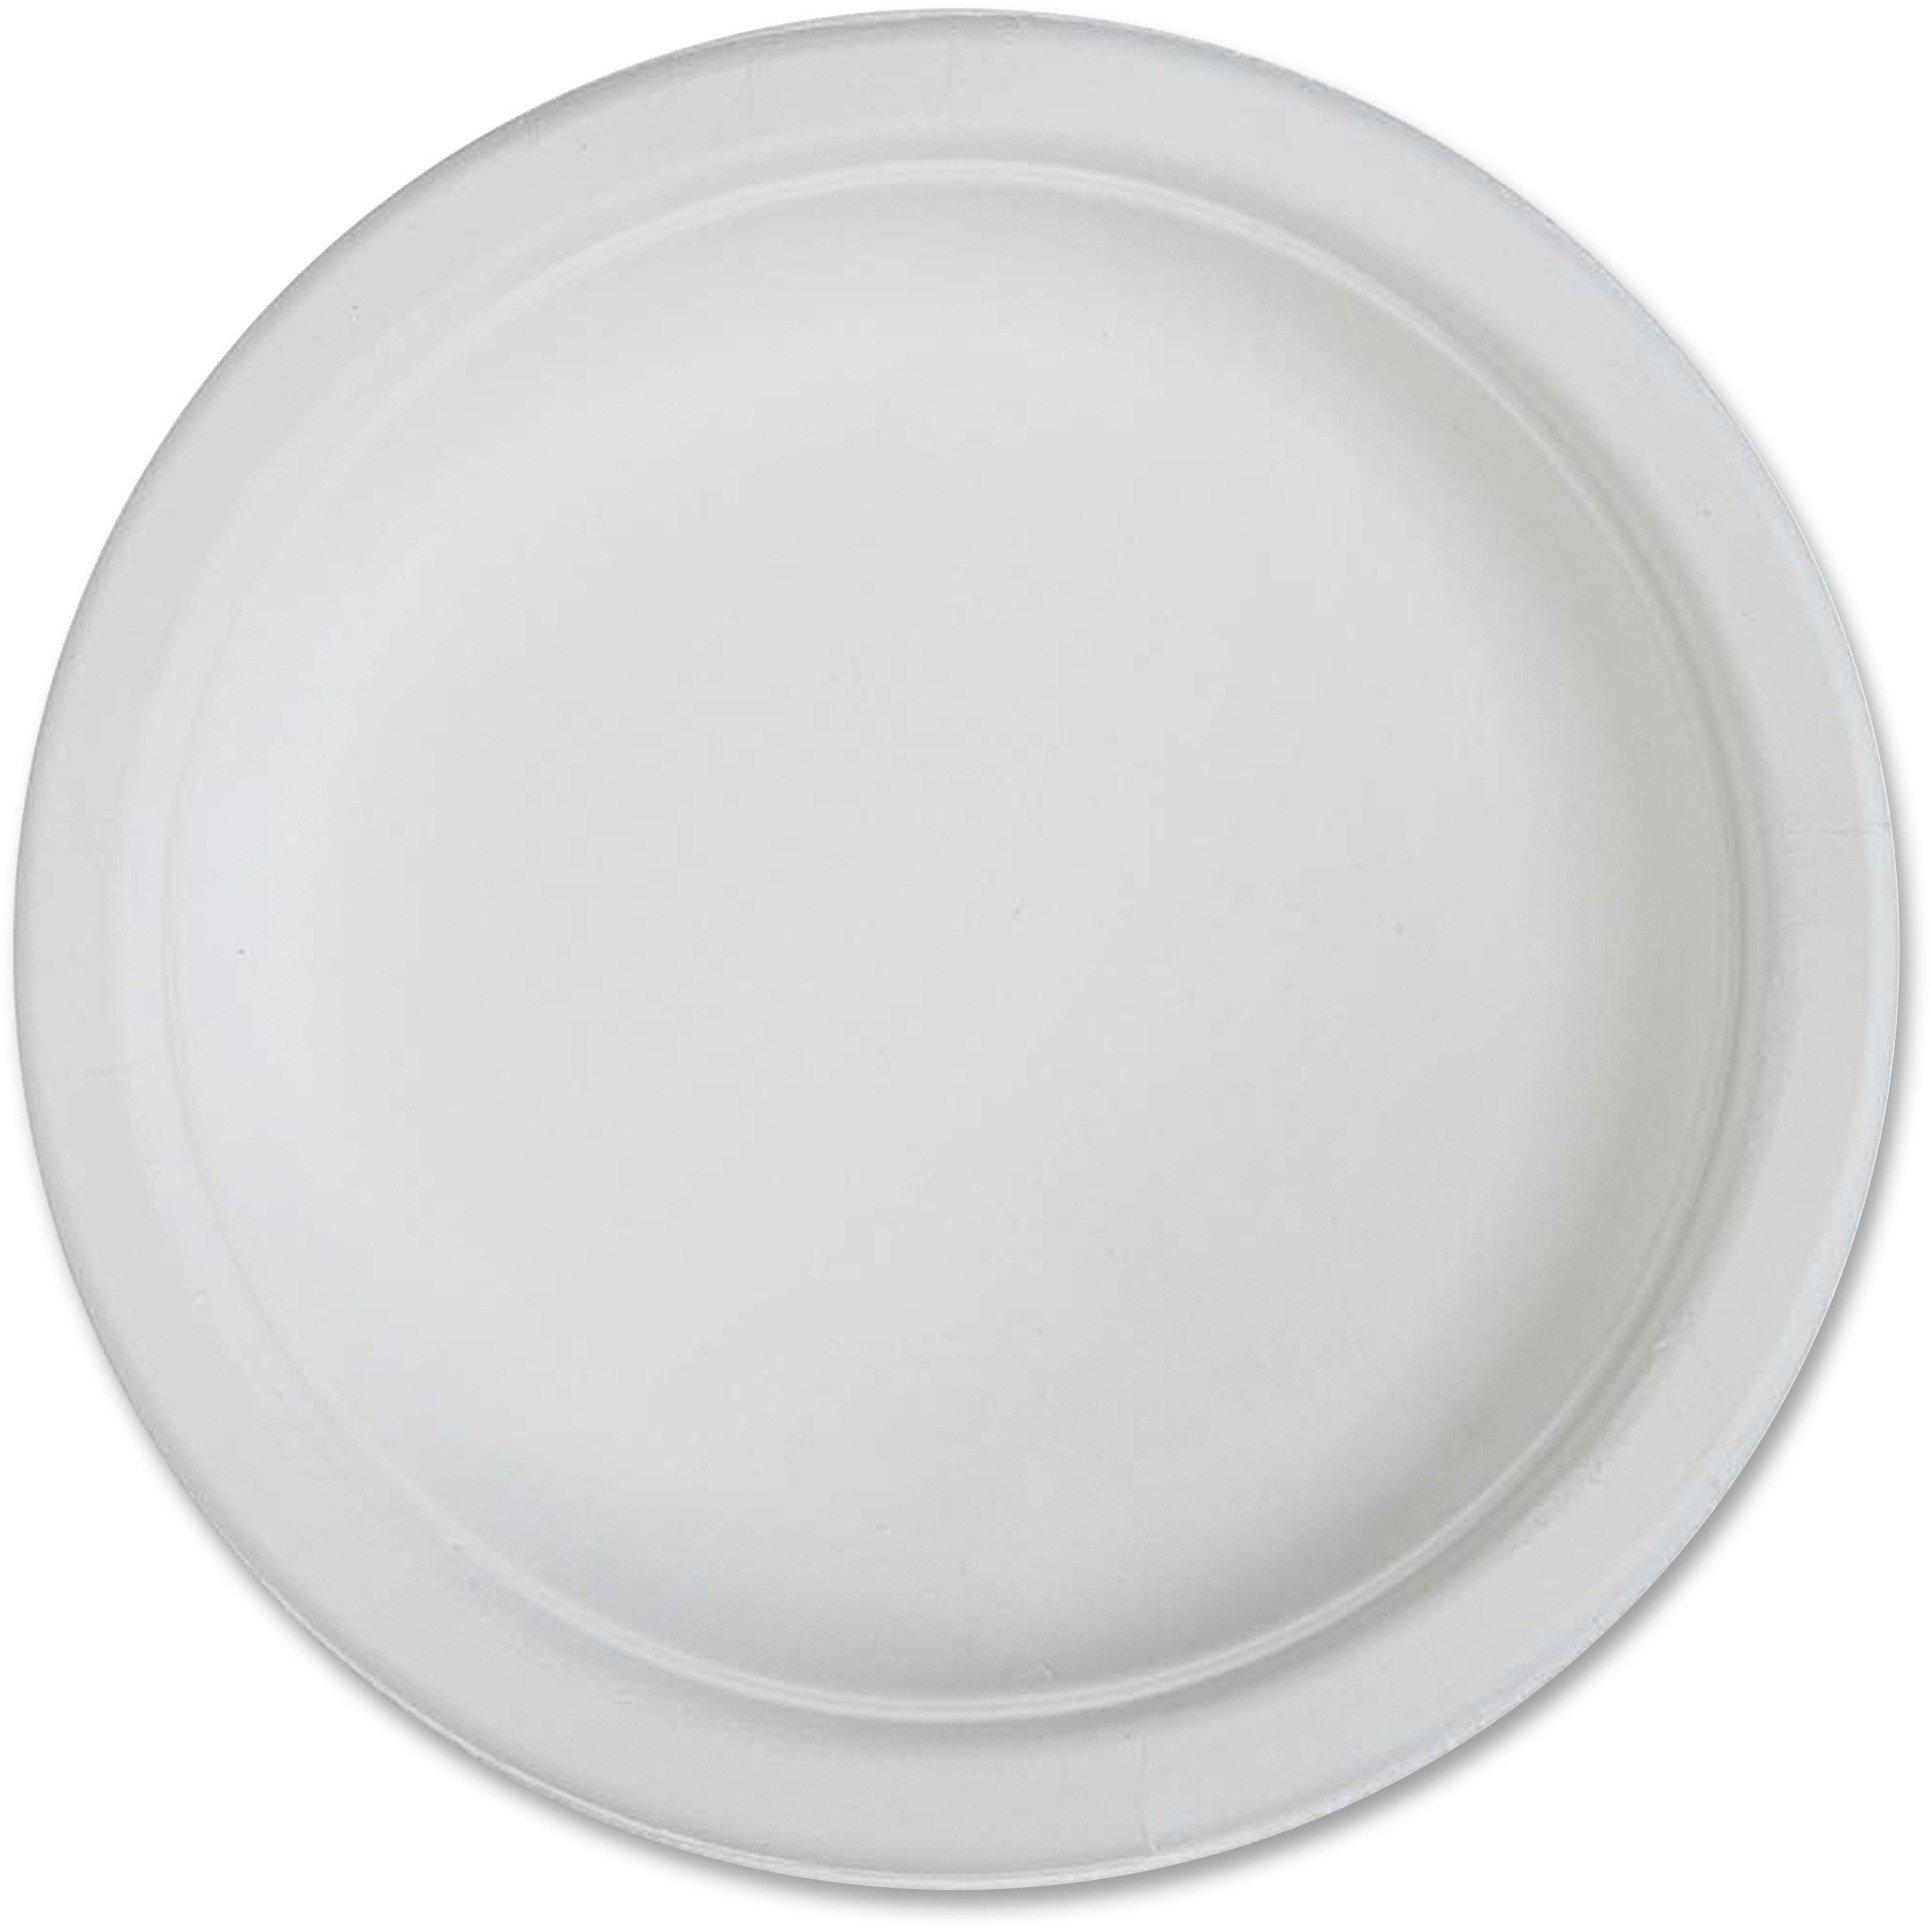 Genuine Joe 10216CT Compostable Plates, 6'', 1000/CT, White